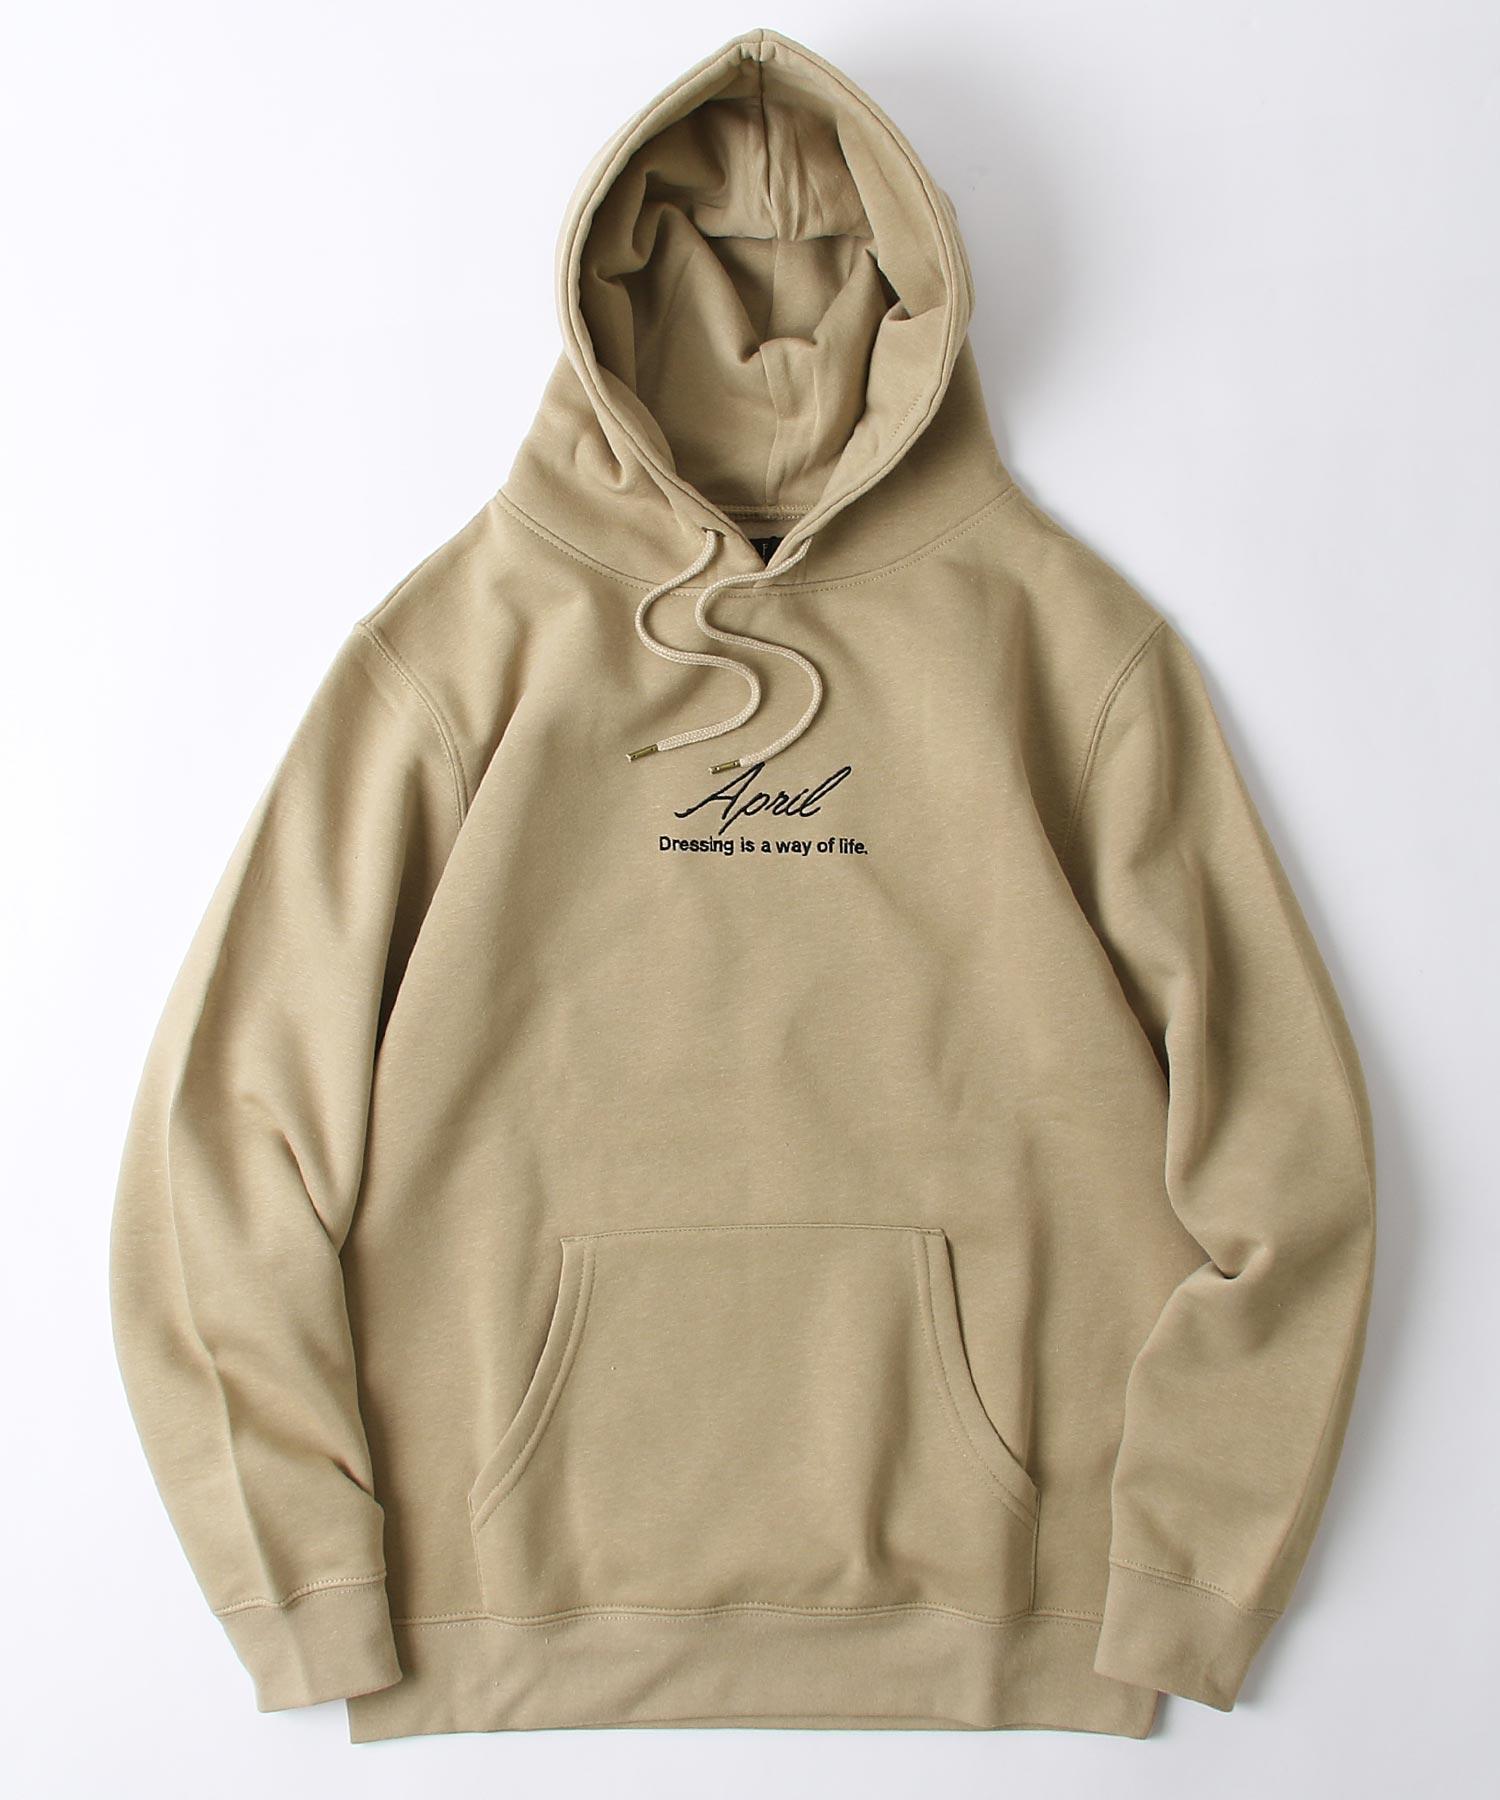 【ZIP】刷毛連帽運動衫【L-XL】 2